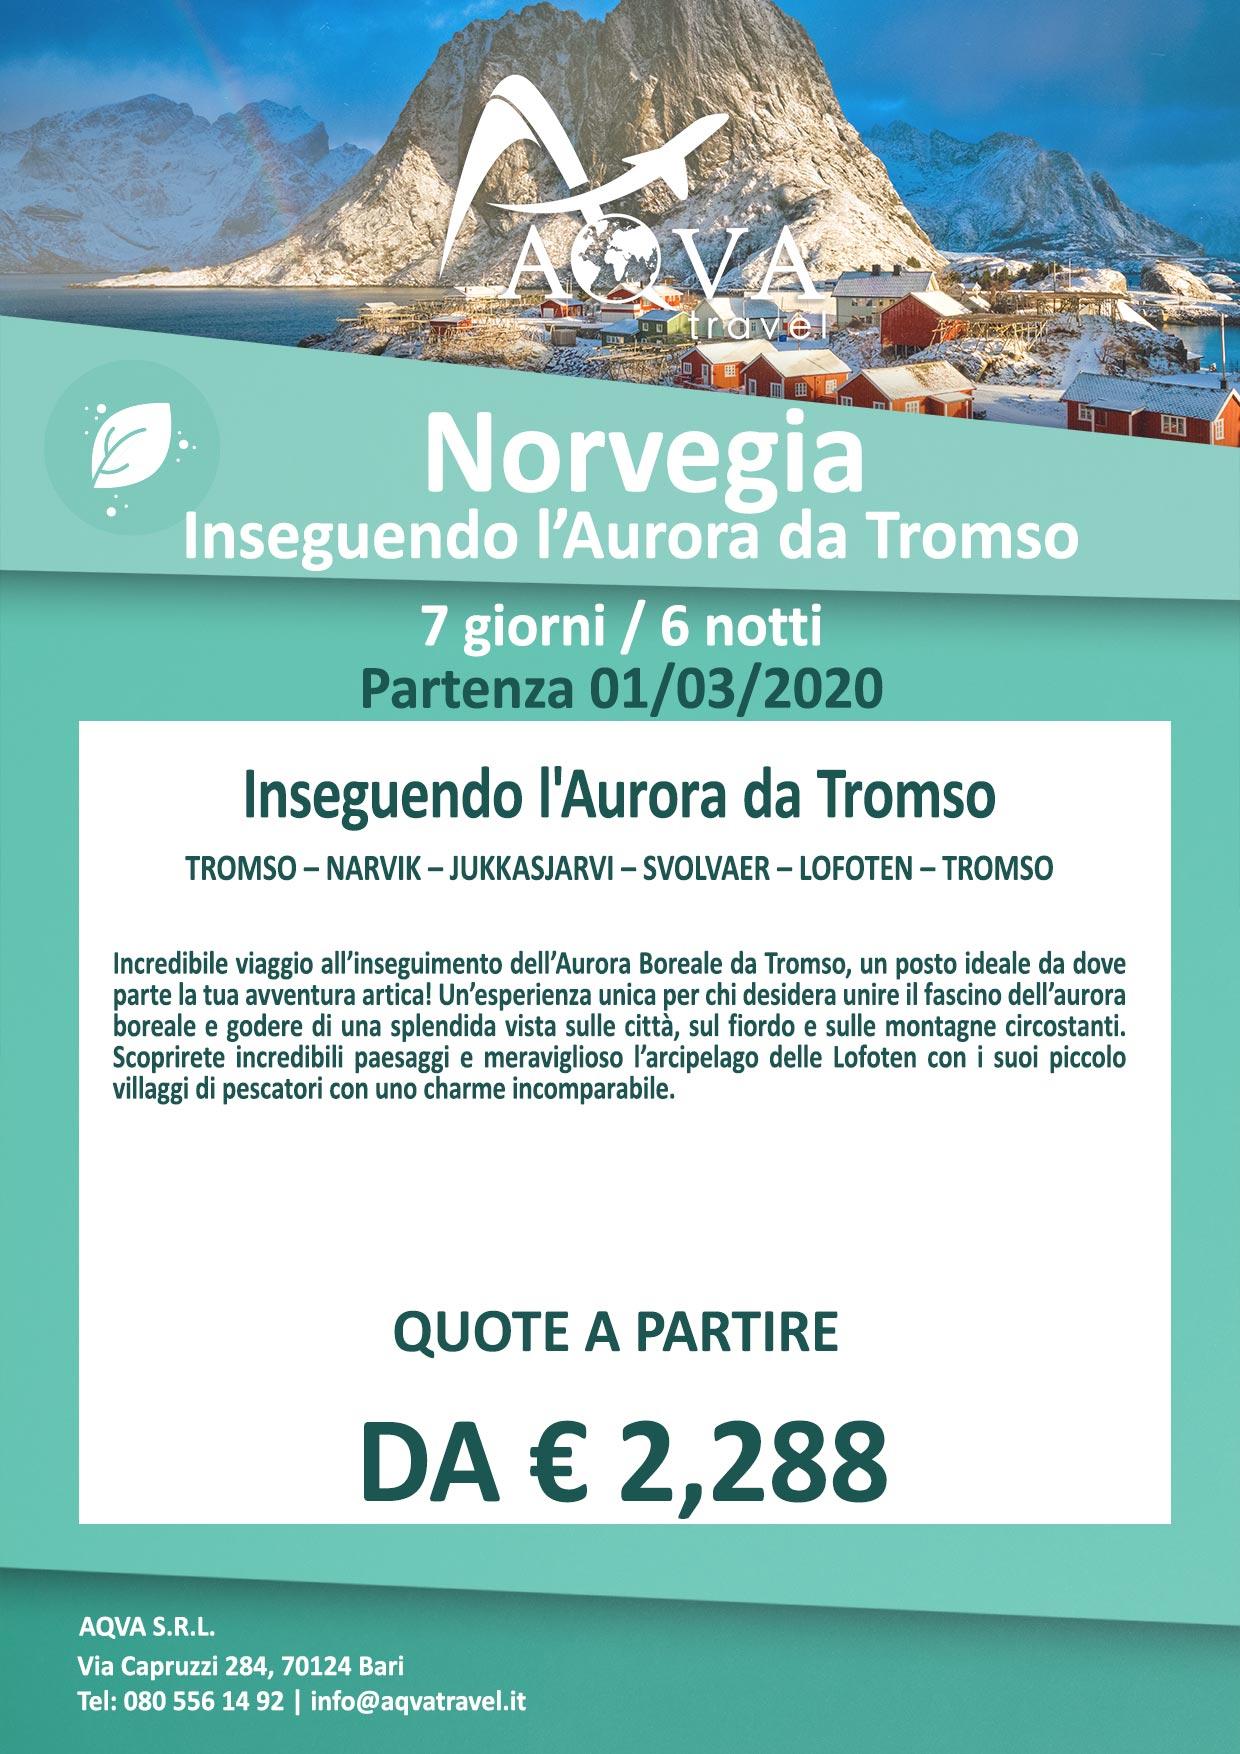 Norvegia-Inseguendo-l'Aurora-da-Tromso-NATURA-offerte-agenzia-di-viaggi-Bari-AQVATRAVEL-it